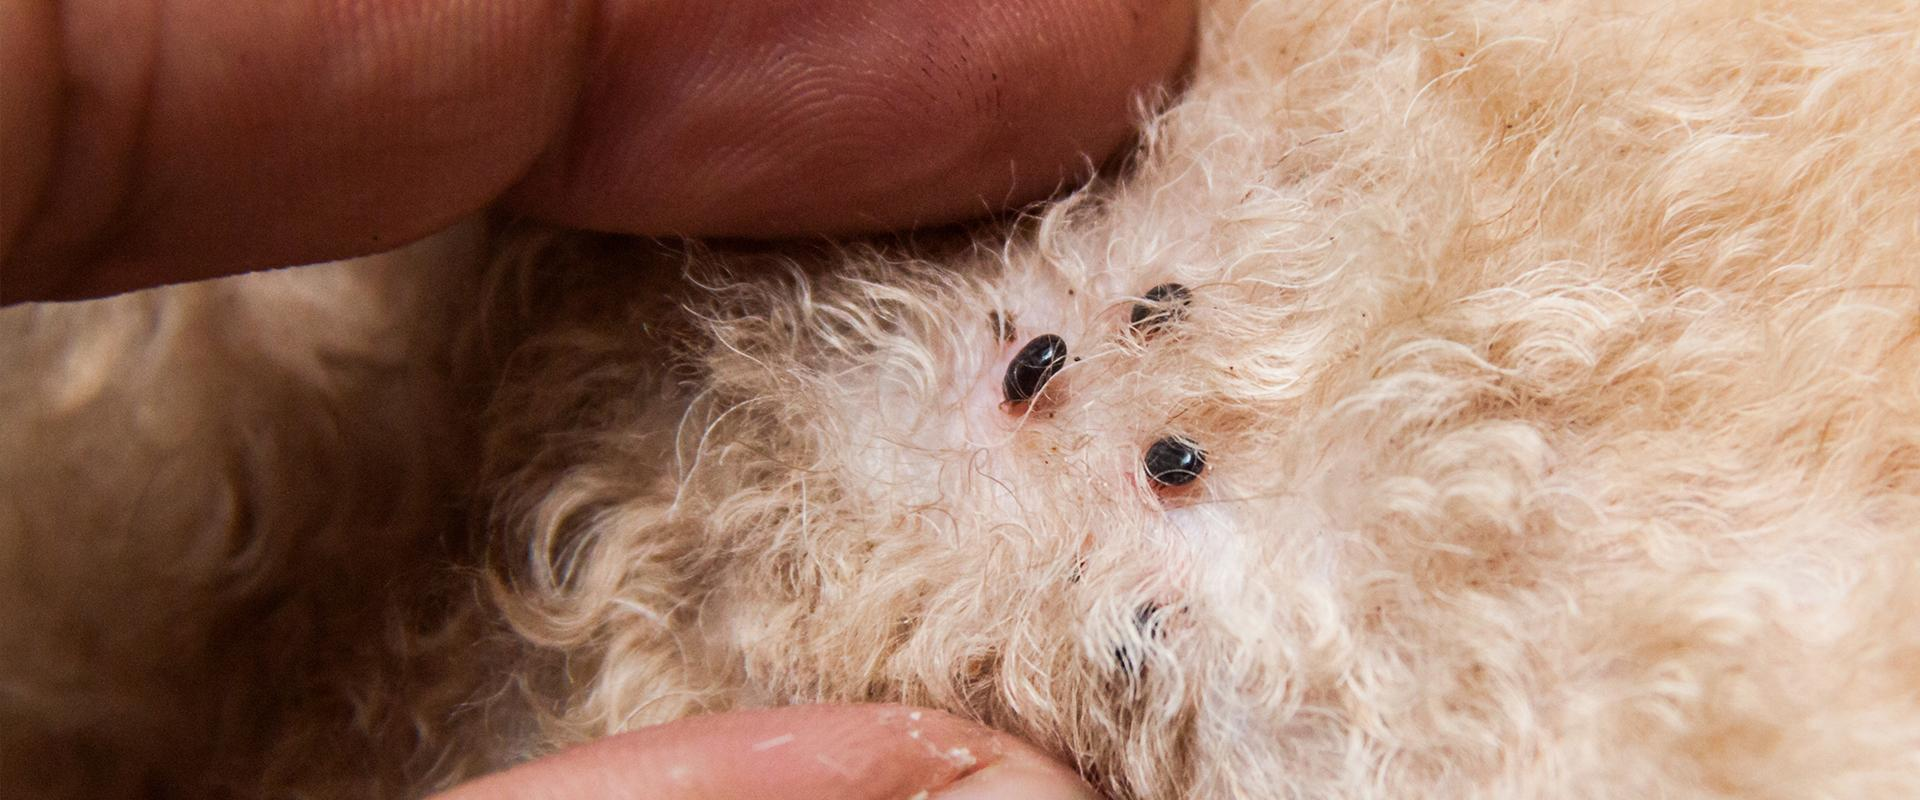 ticks in dog hair in meridian idaho